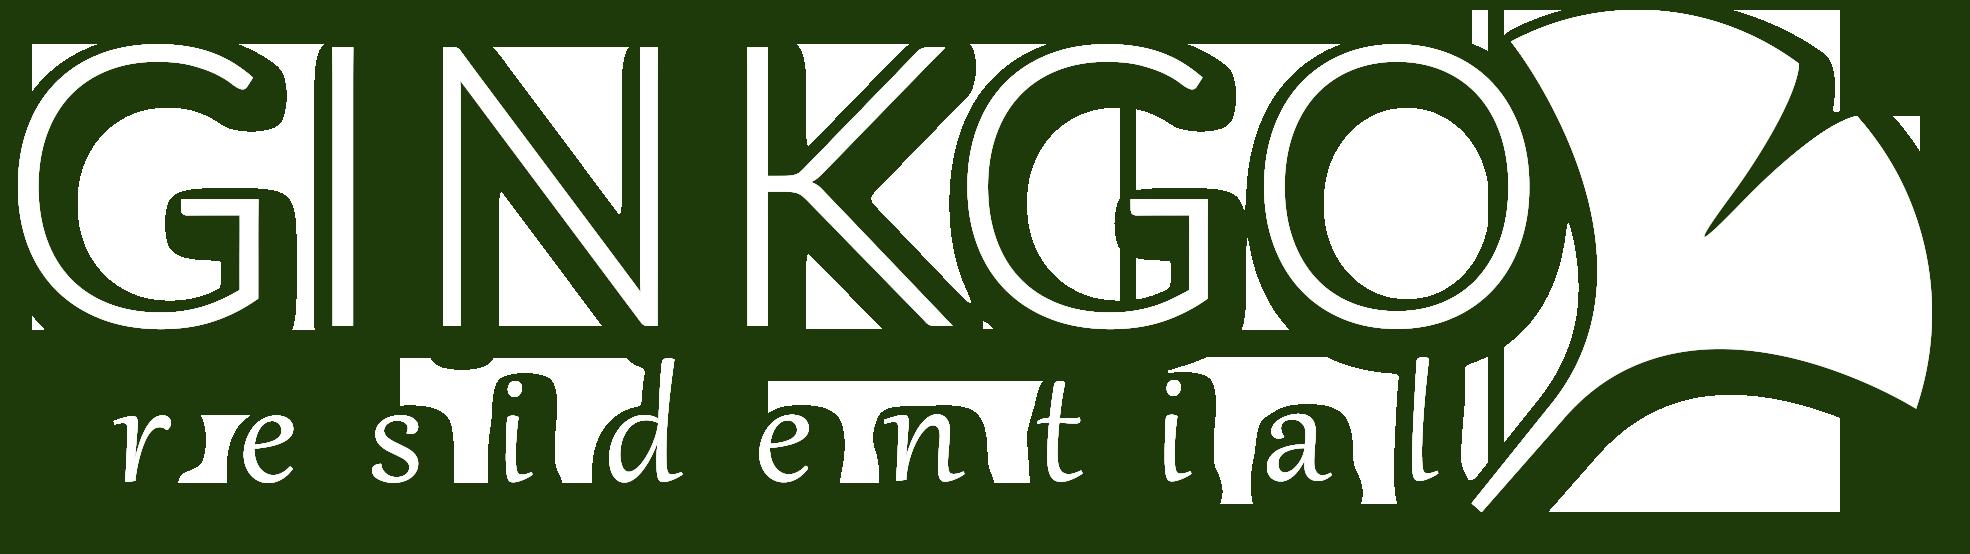 Ginkgo Residential | logo banner